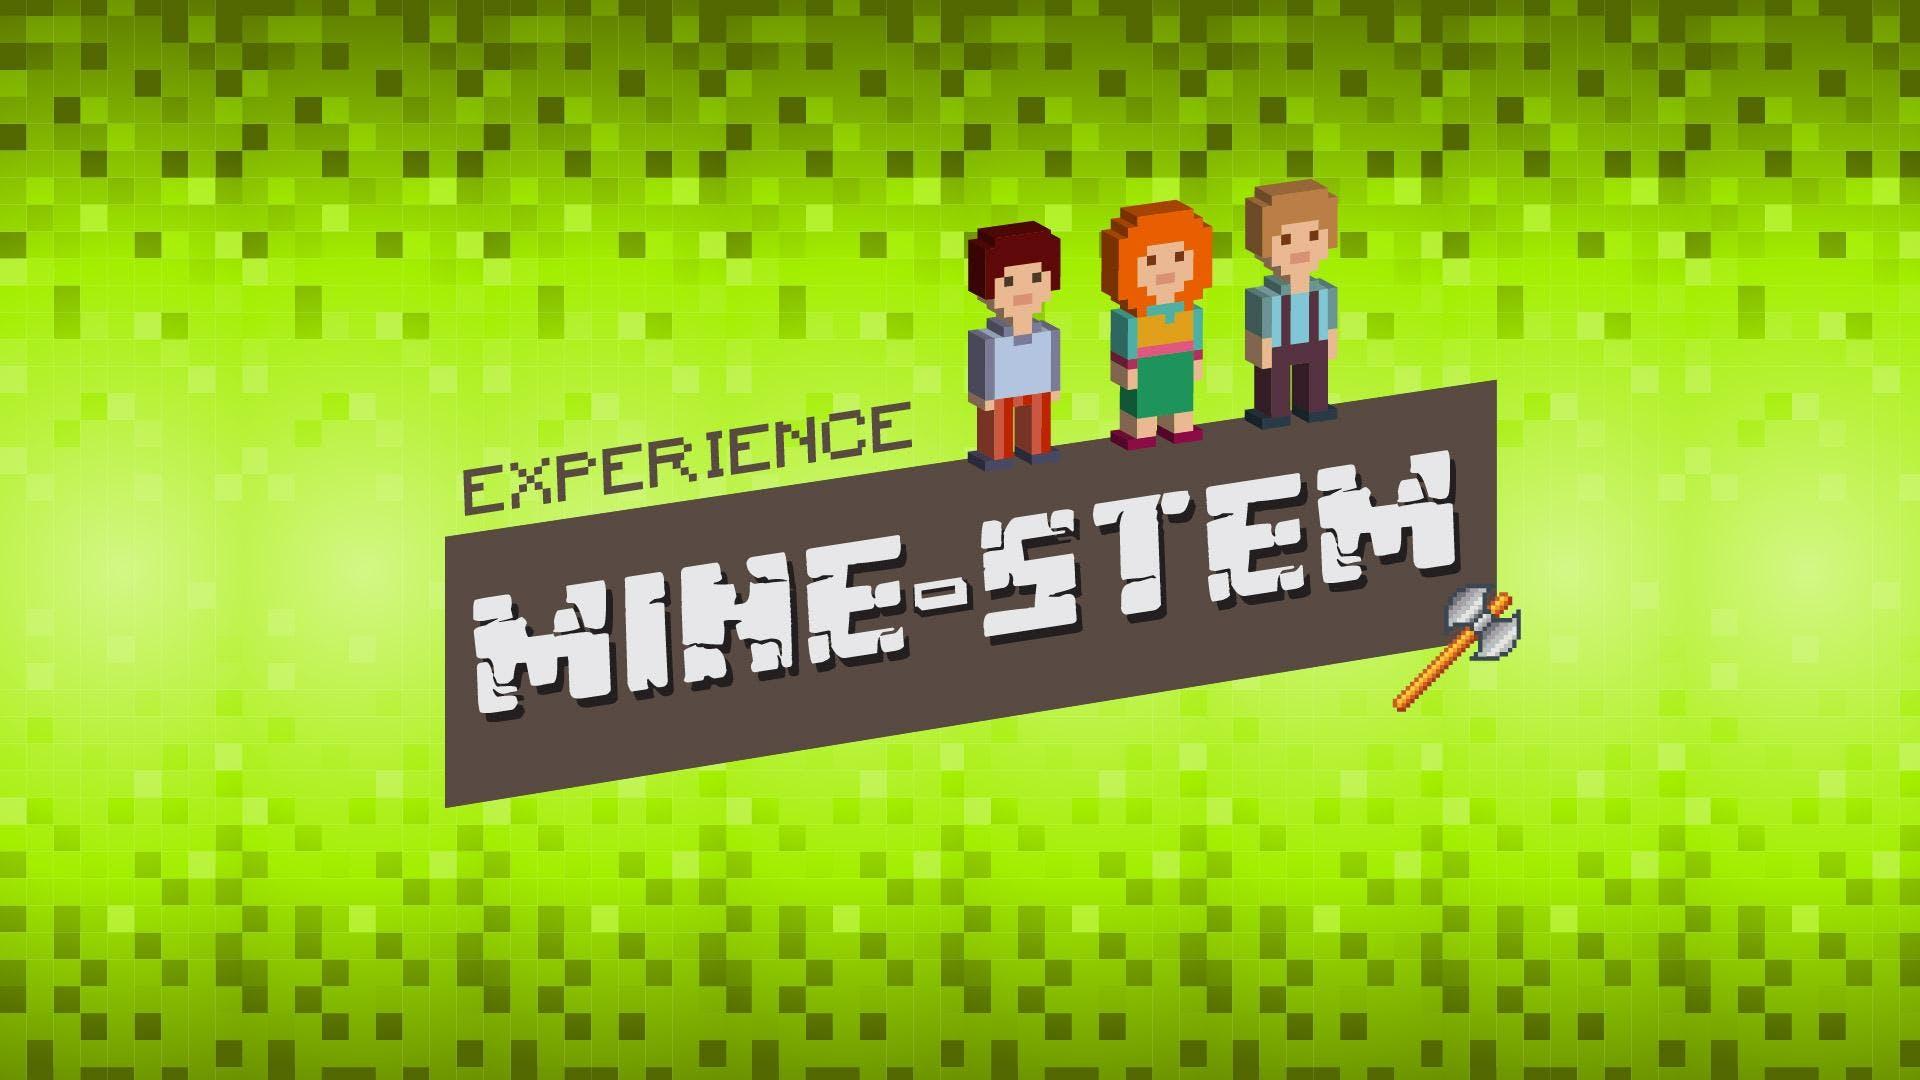 Mine-STEM Experience